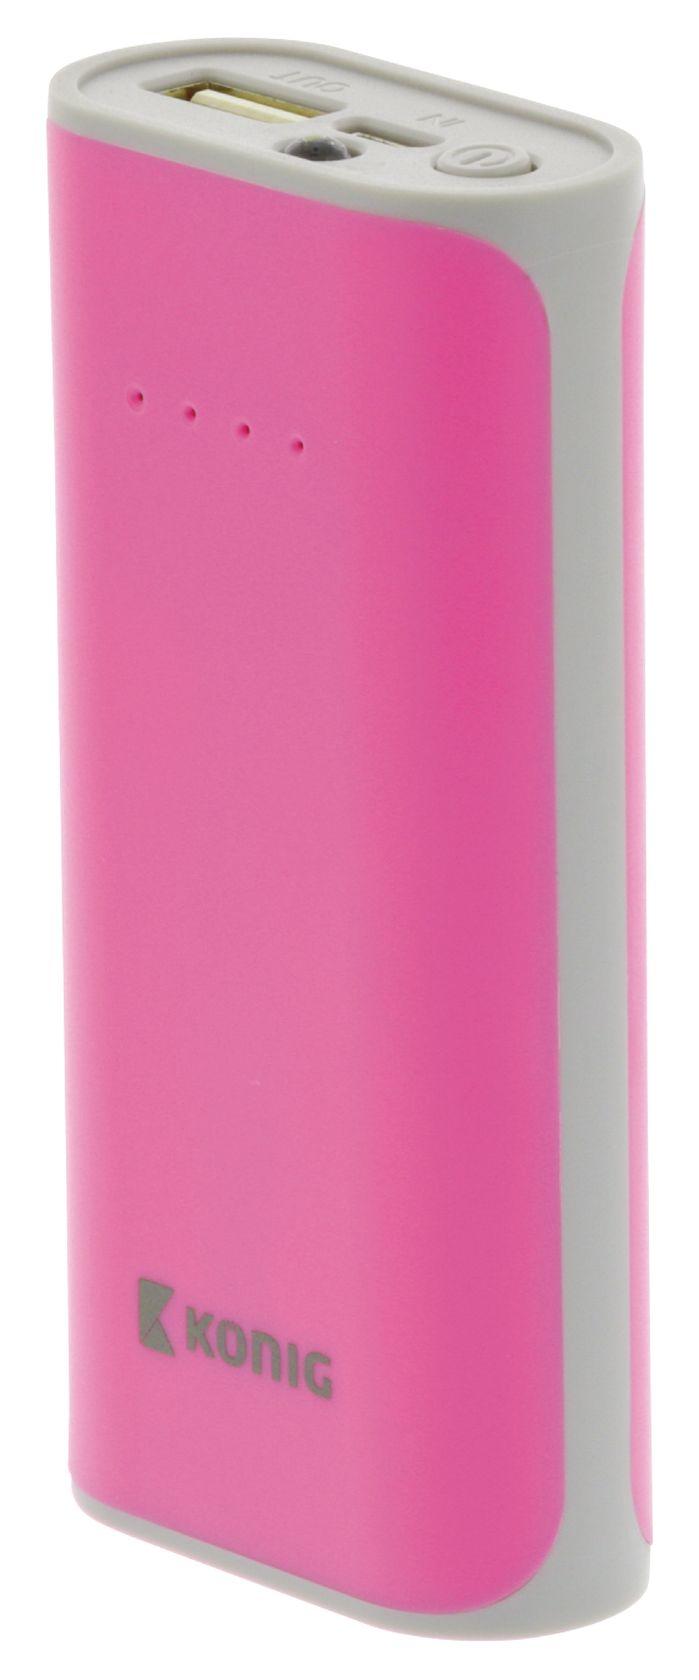 Draagbare Powerbank 5000 mAh USB Roze-Grijs